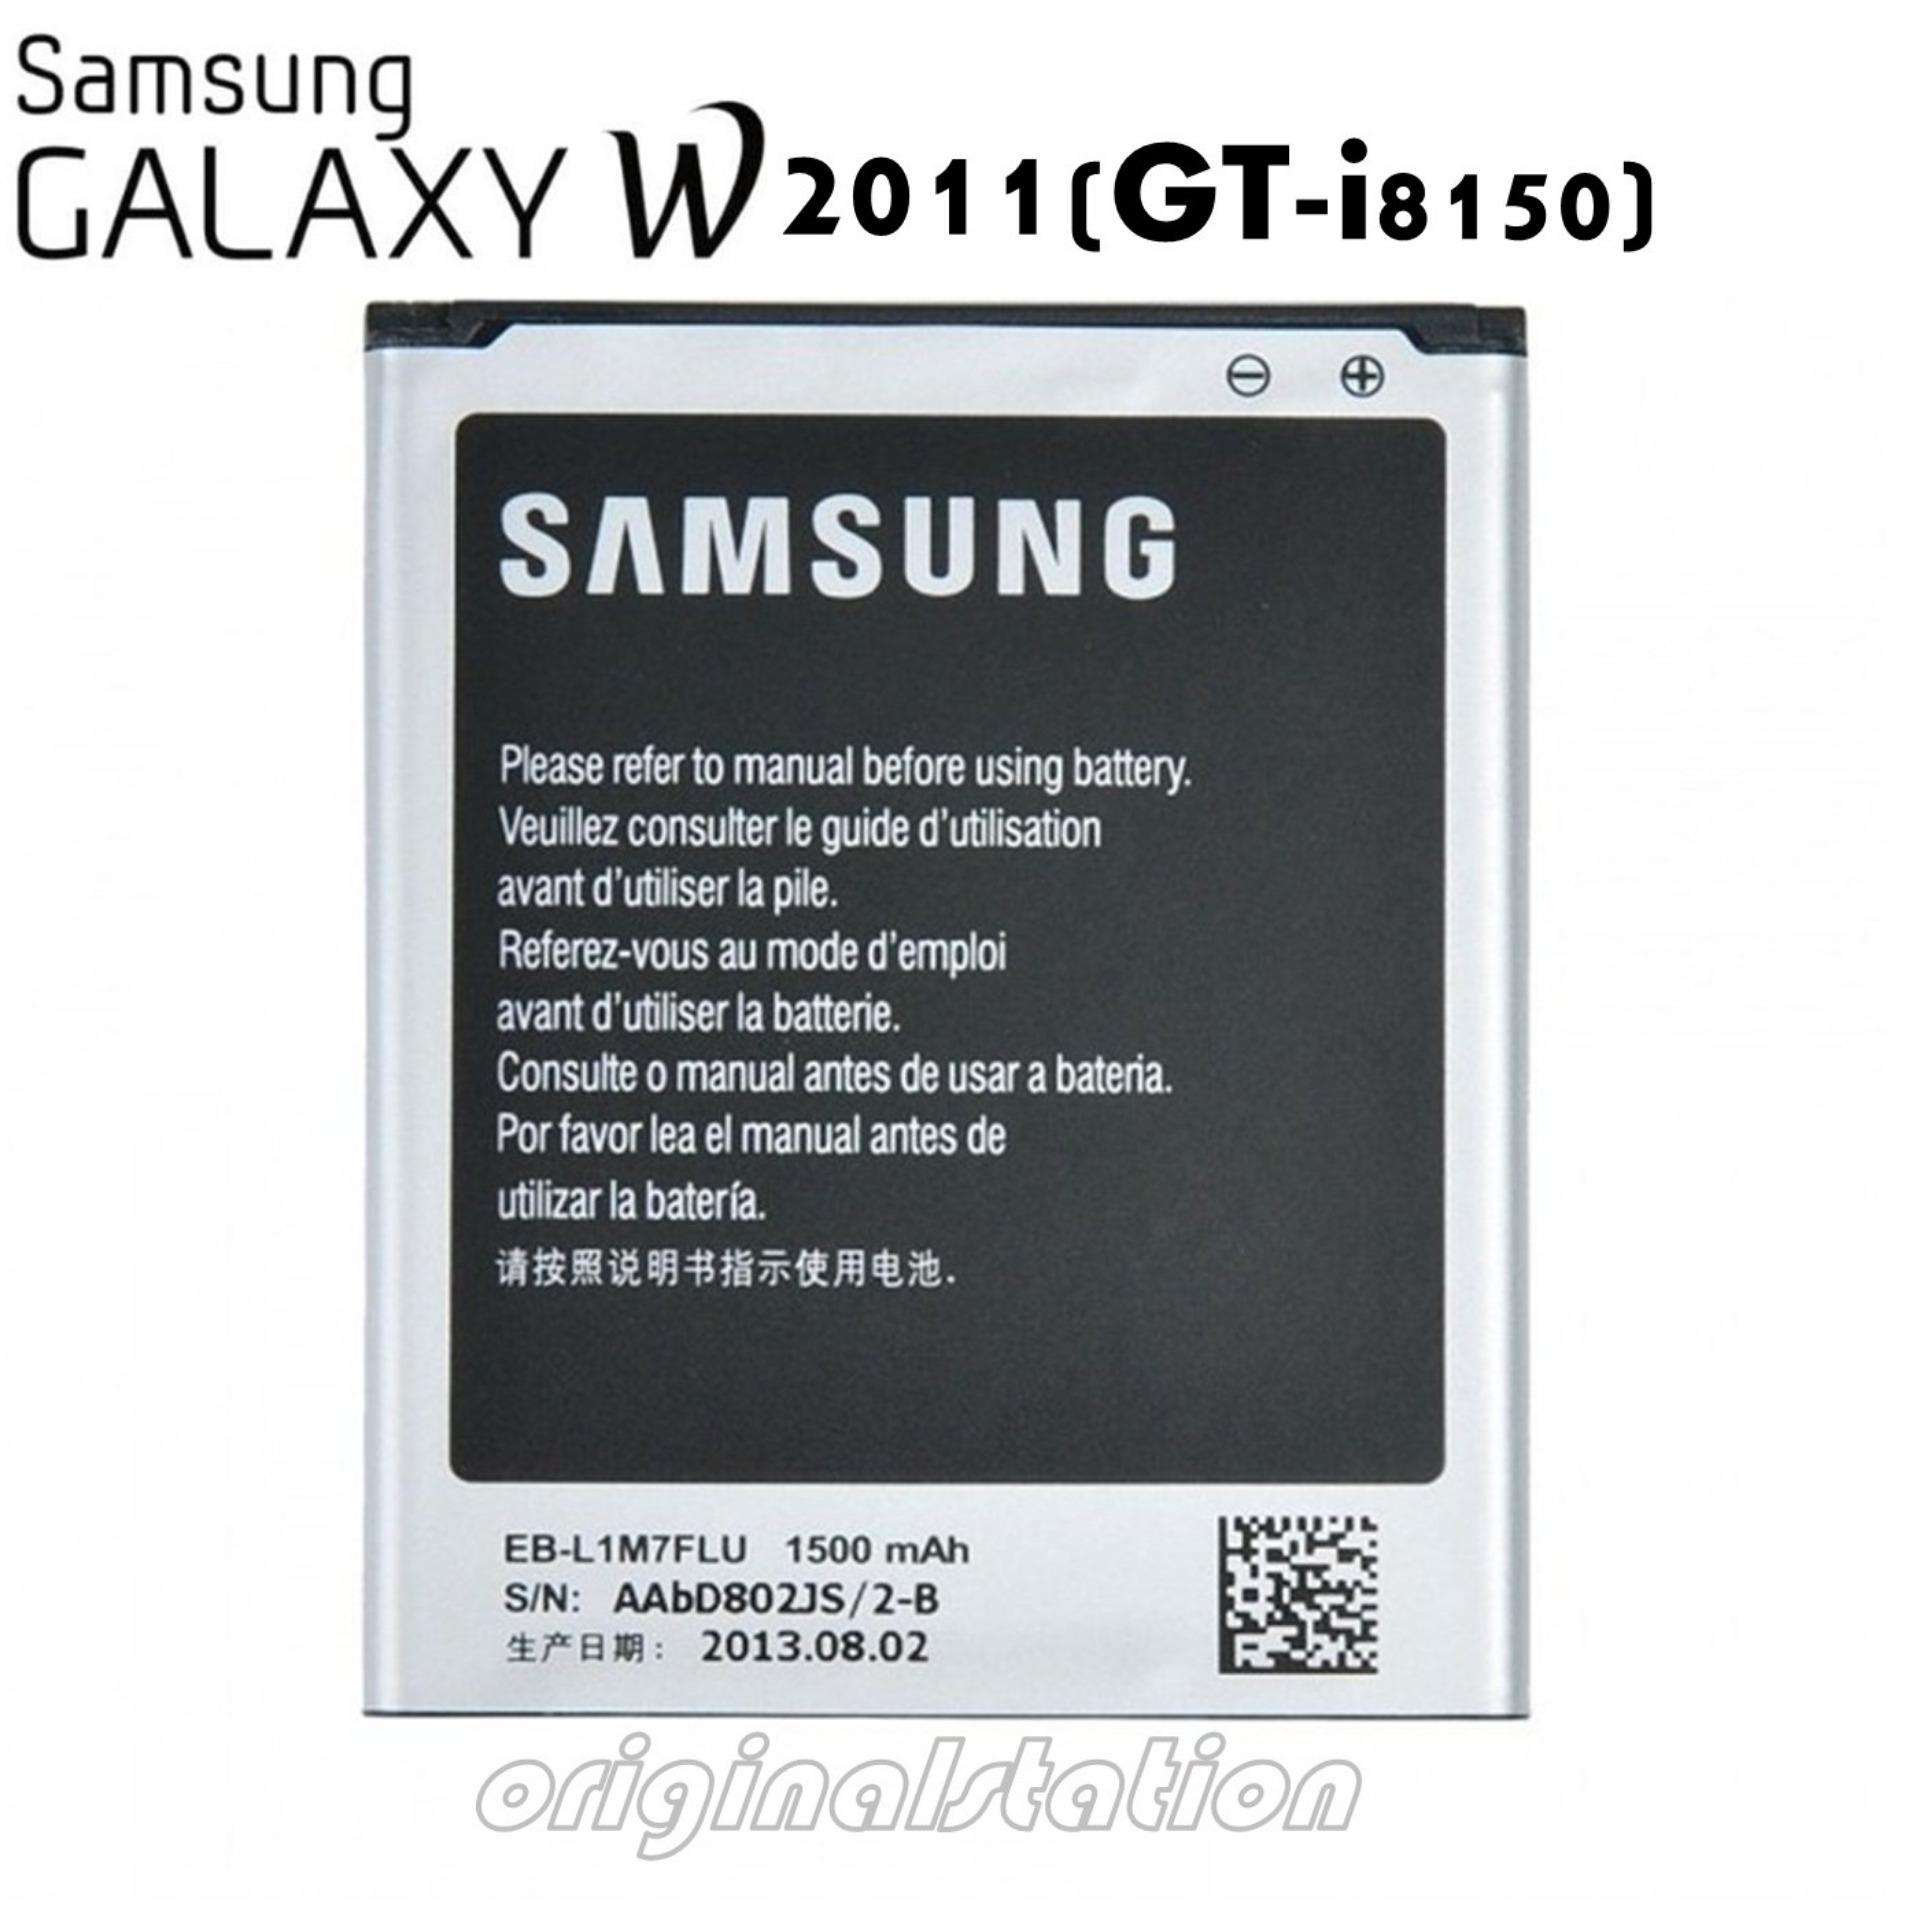 Spesifikasi Samsung Galaxy Baterai Wonder 2011 Series Gt I8150 Kapasitas 1500 Mah Original Online